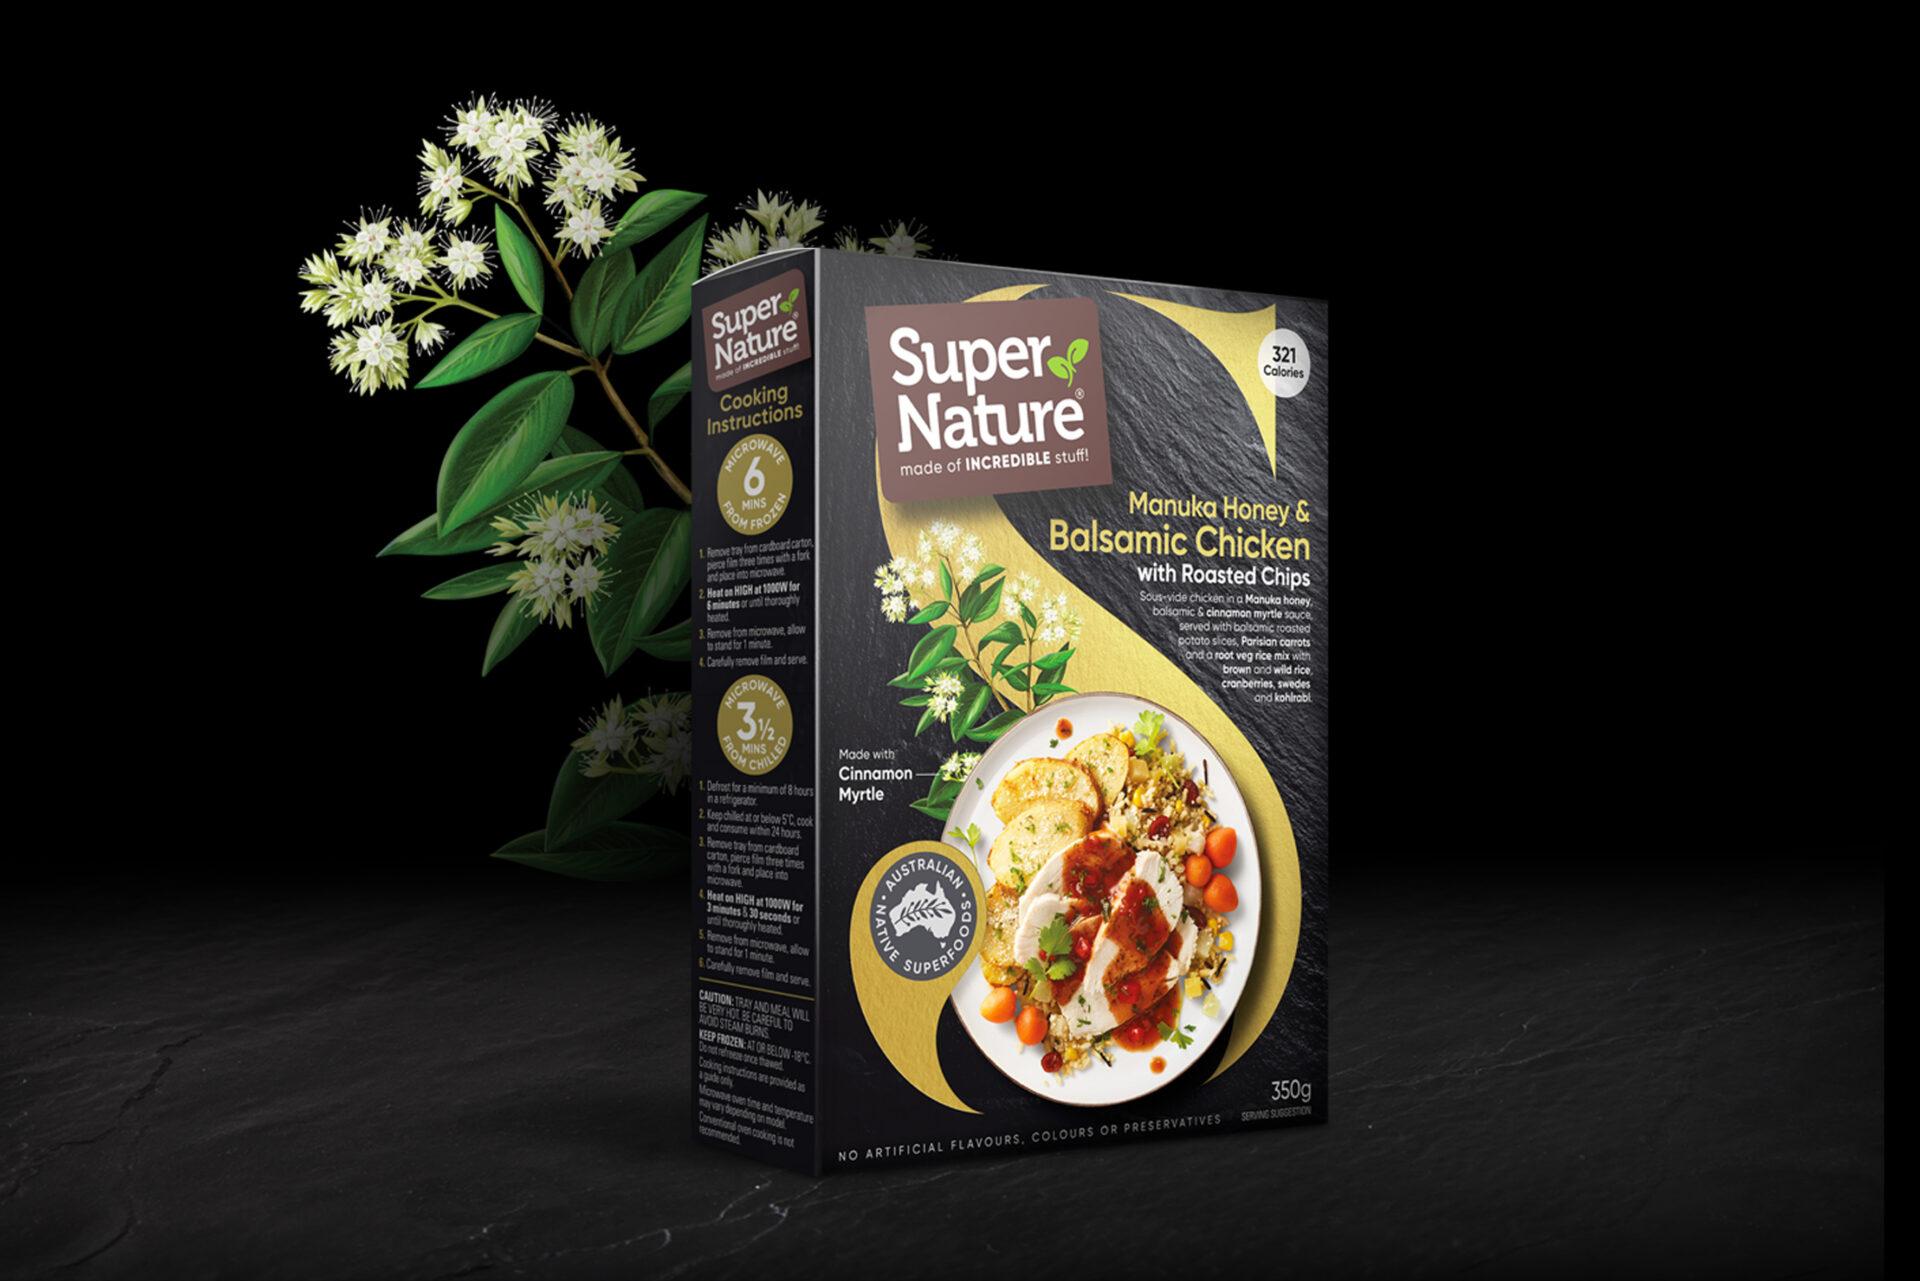 Packaging Design Super Nature Manuka Honey & Balsamic Chicken